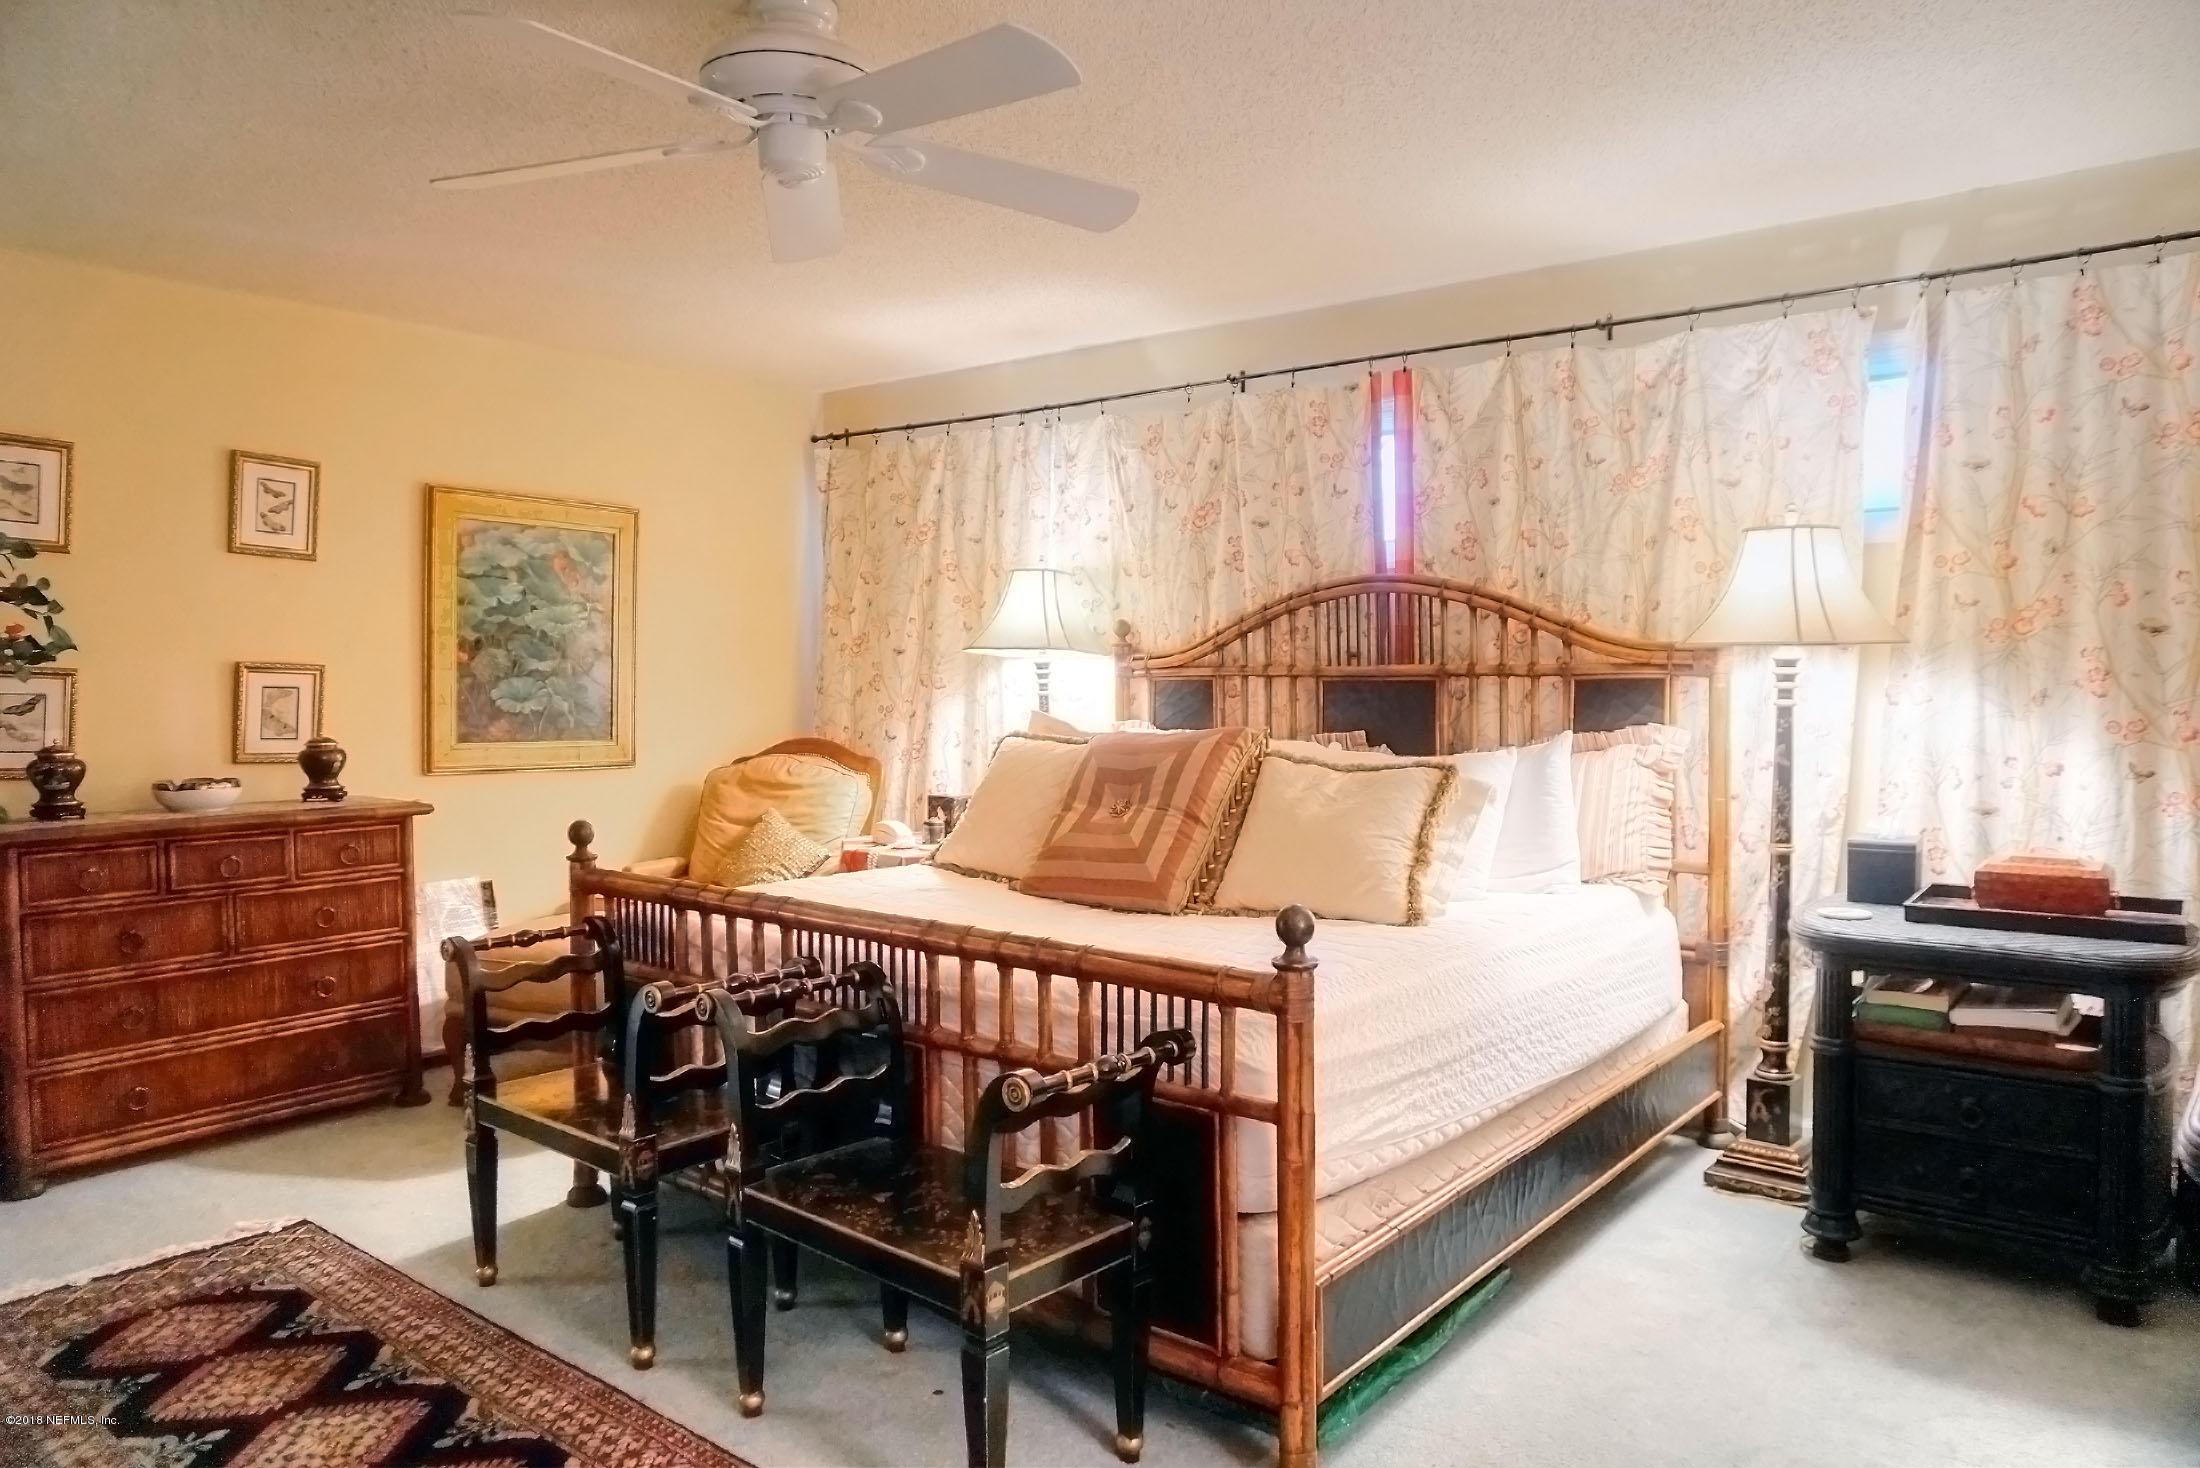 111 SEA MARSH, FERNANDINA BEACH, FLORIDA 32034, 5 Bedrooms Bedrooms, ,4 BathroomsBathrooms,Residential - single family,For sale,SEA MARSH,943936